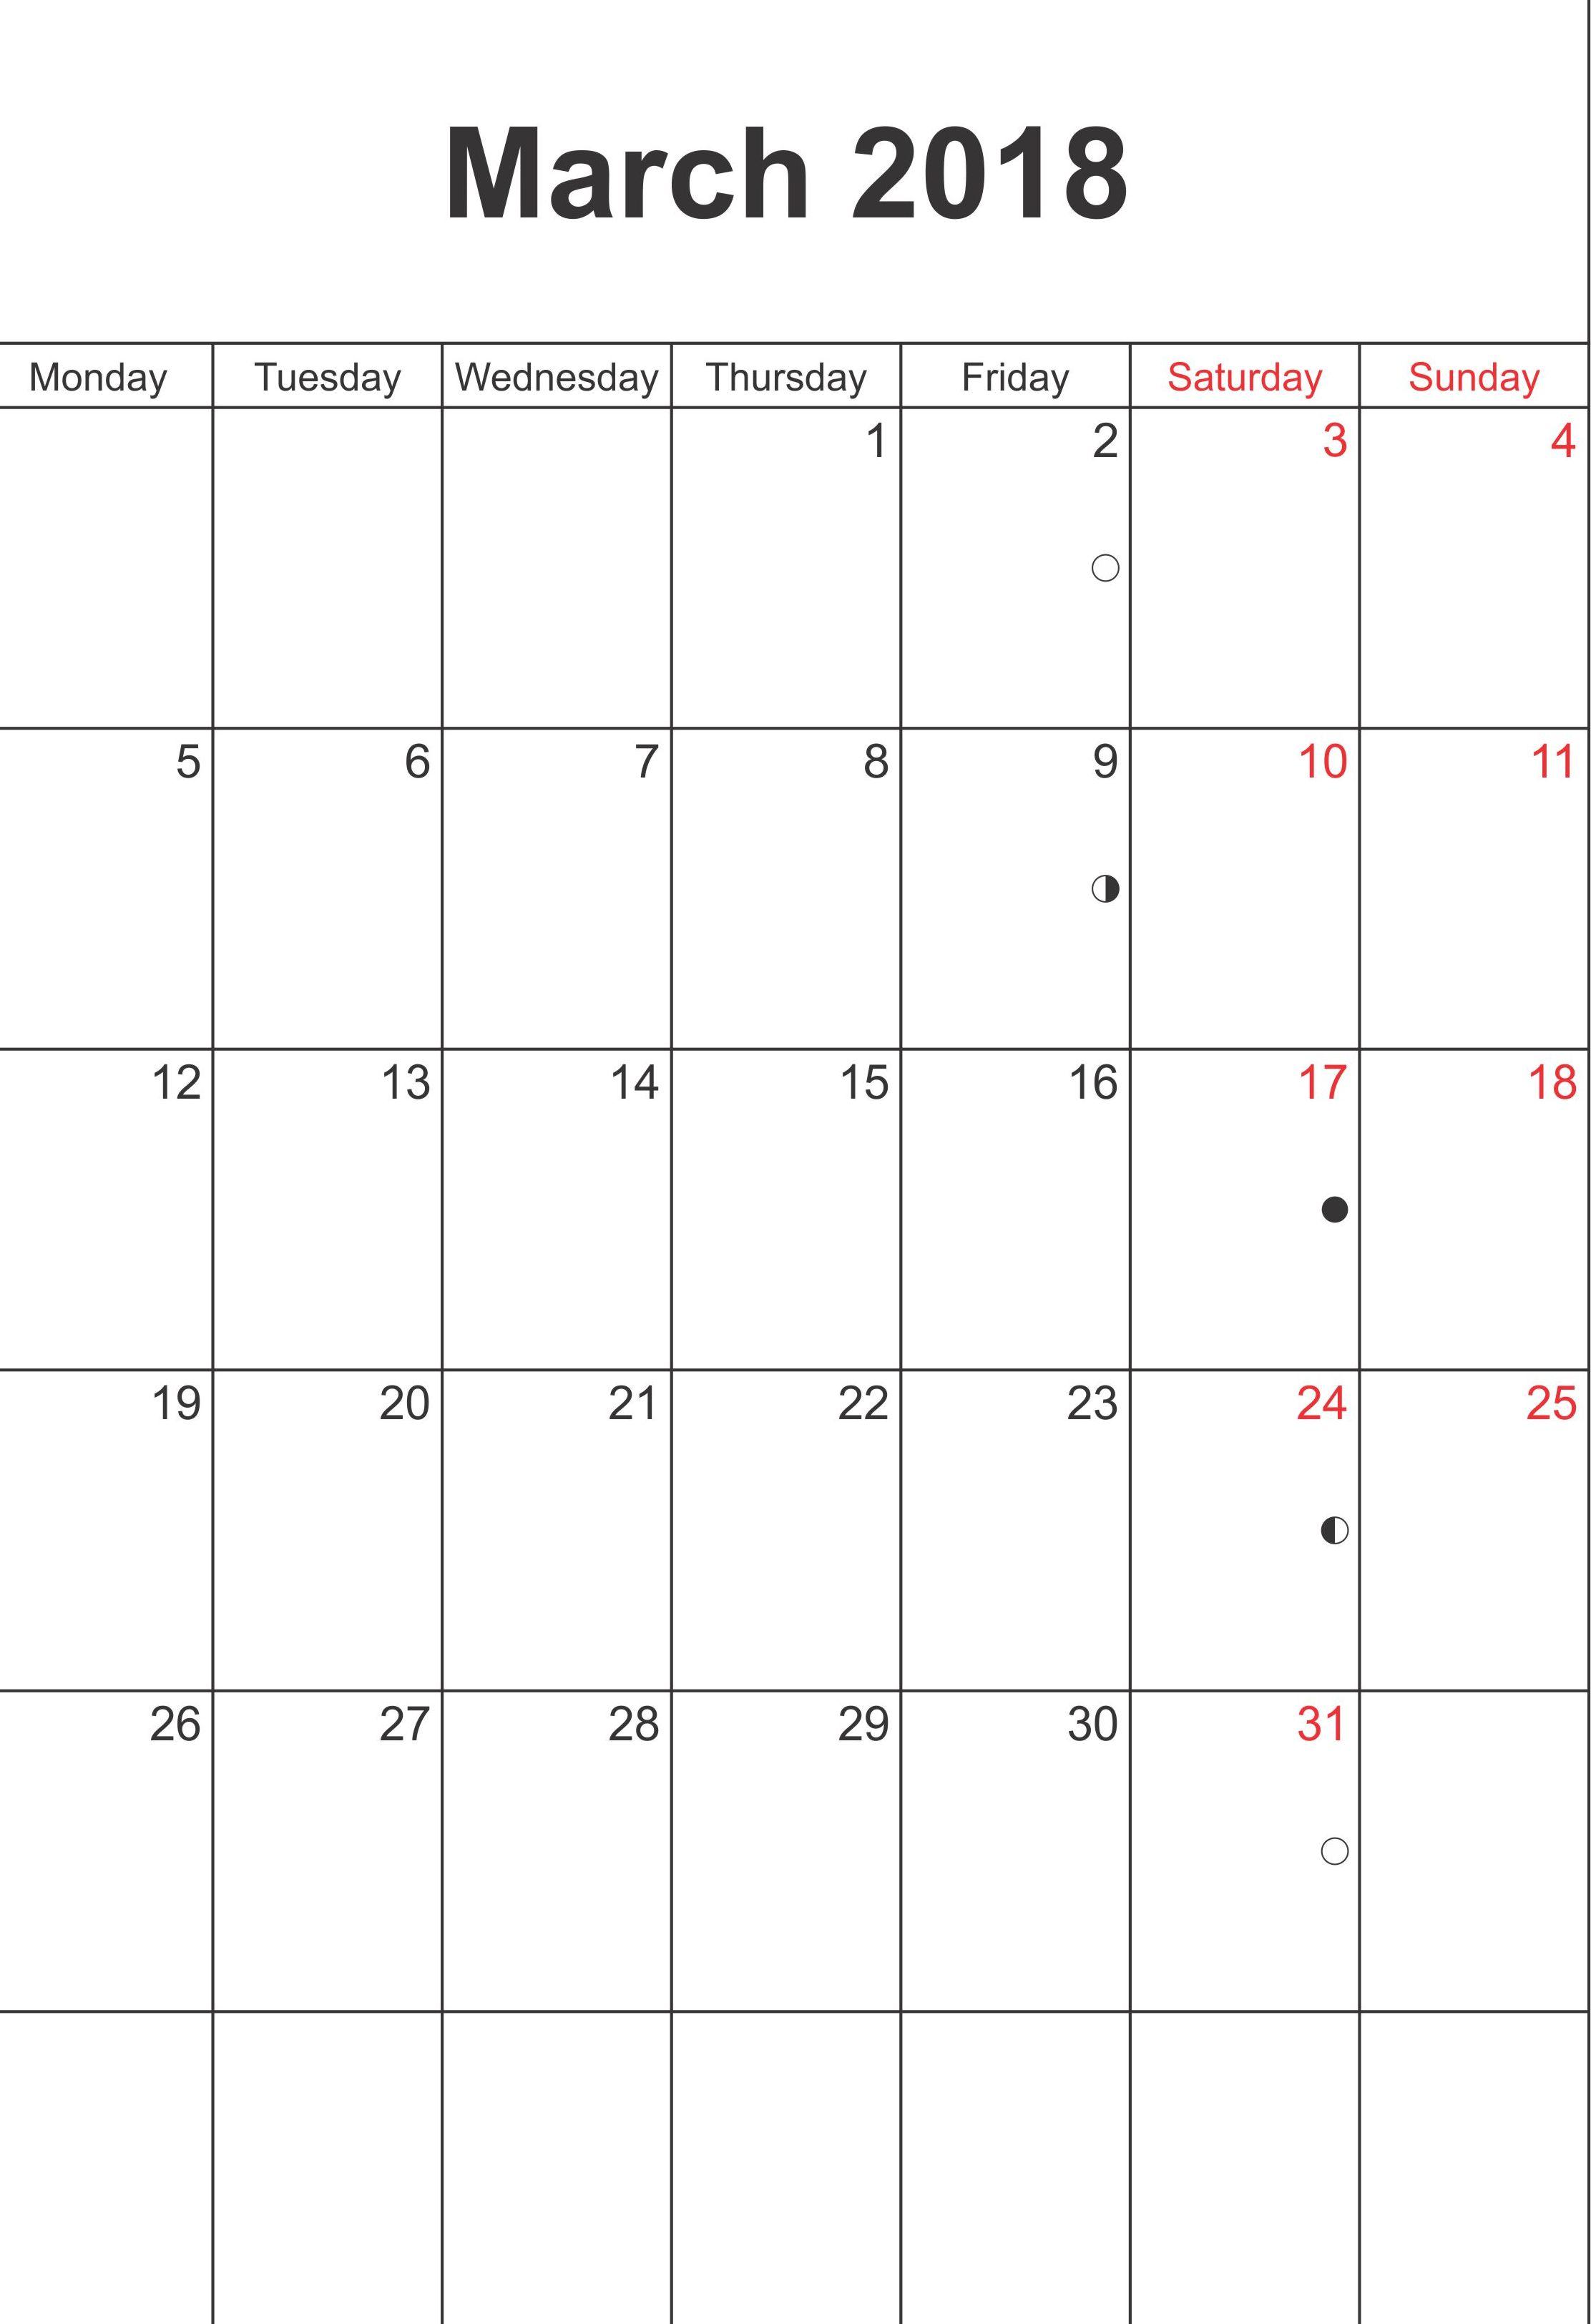 Printable March 2018 Calendar Template